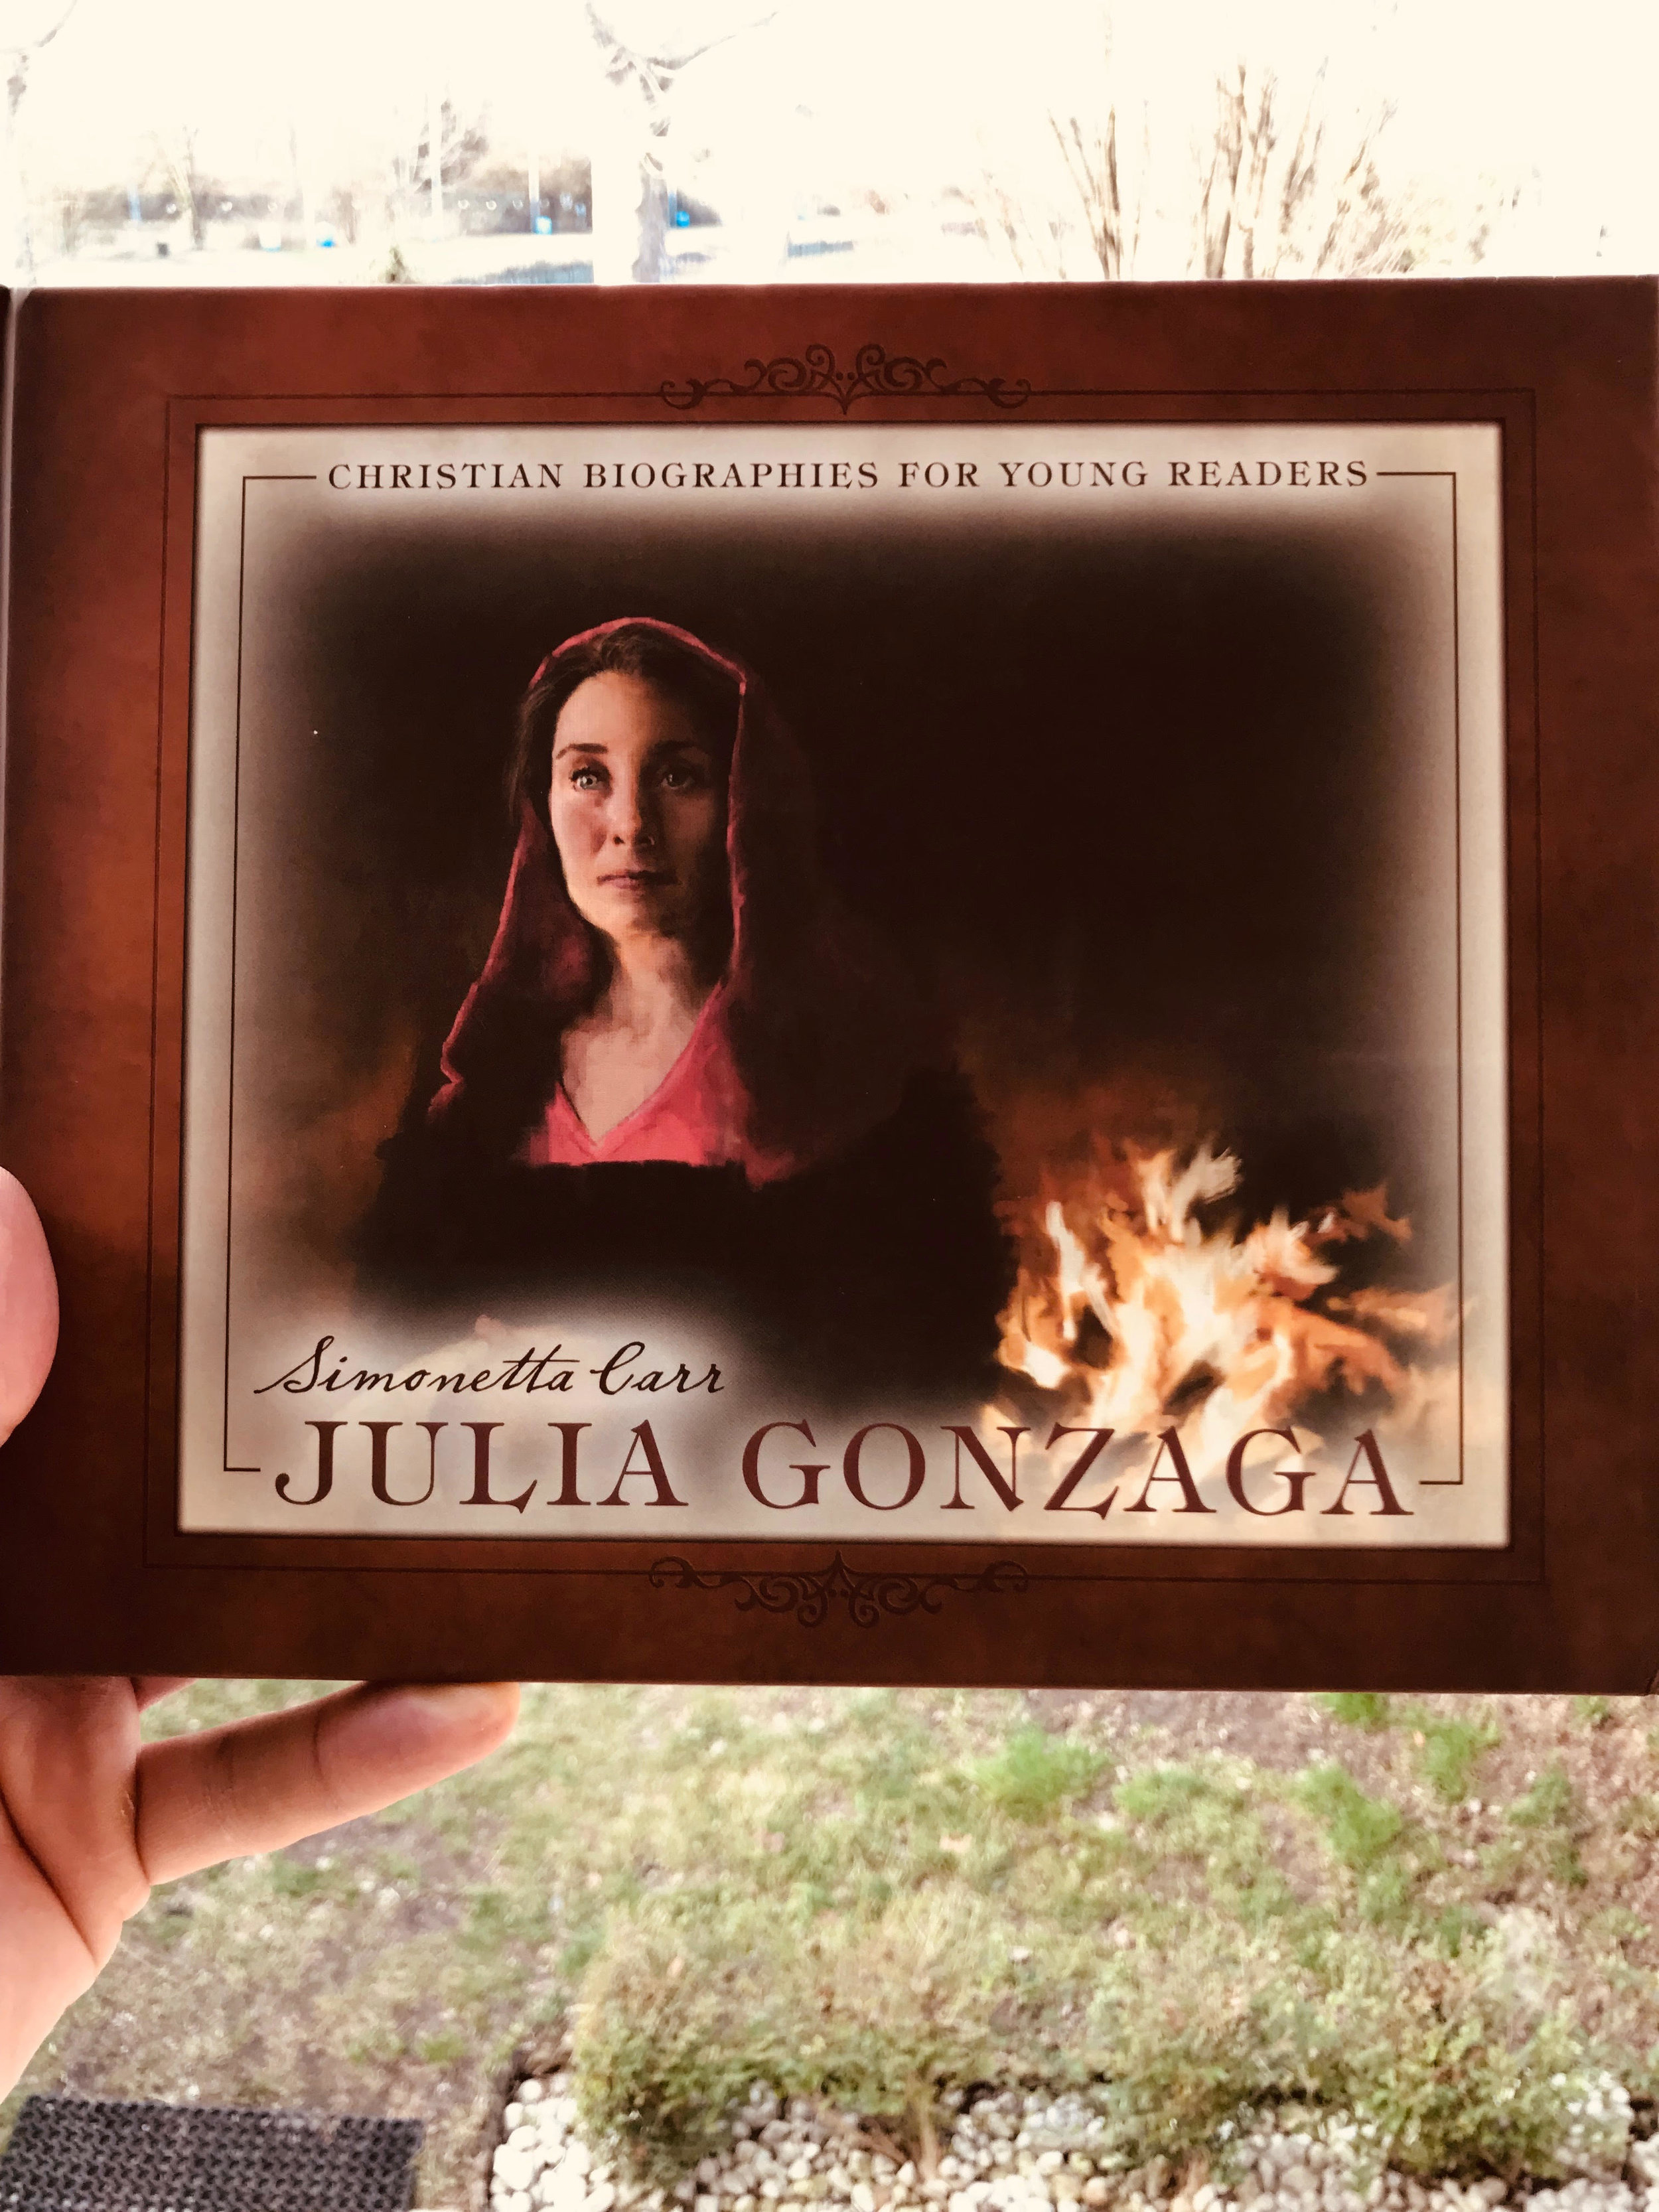 Gonzaga.jpg